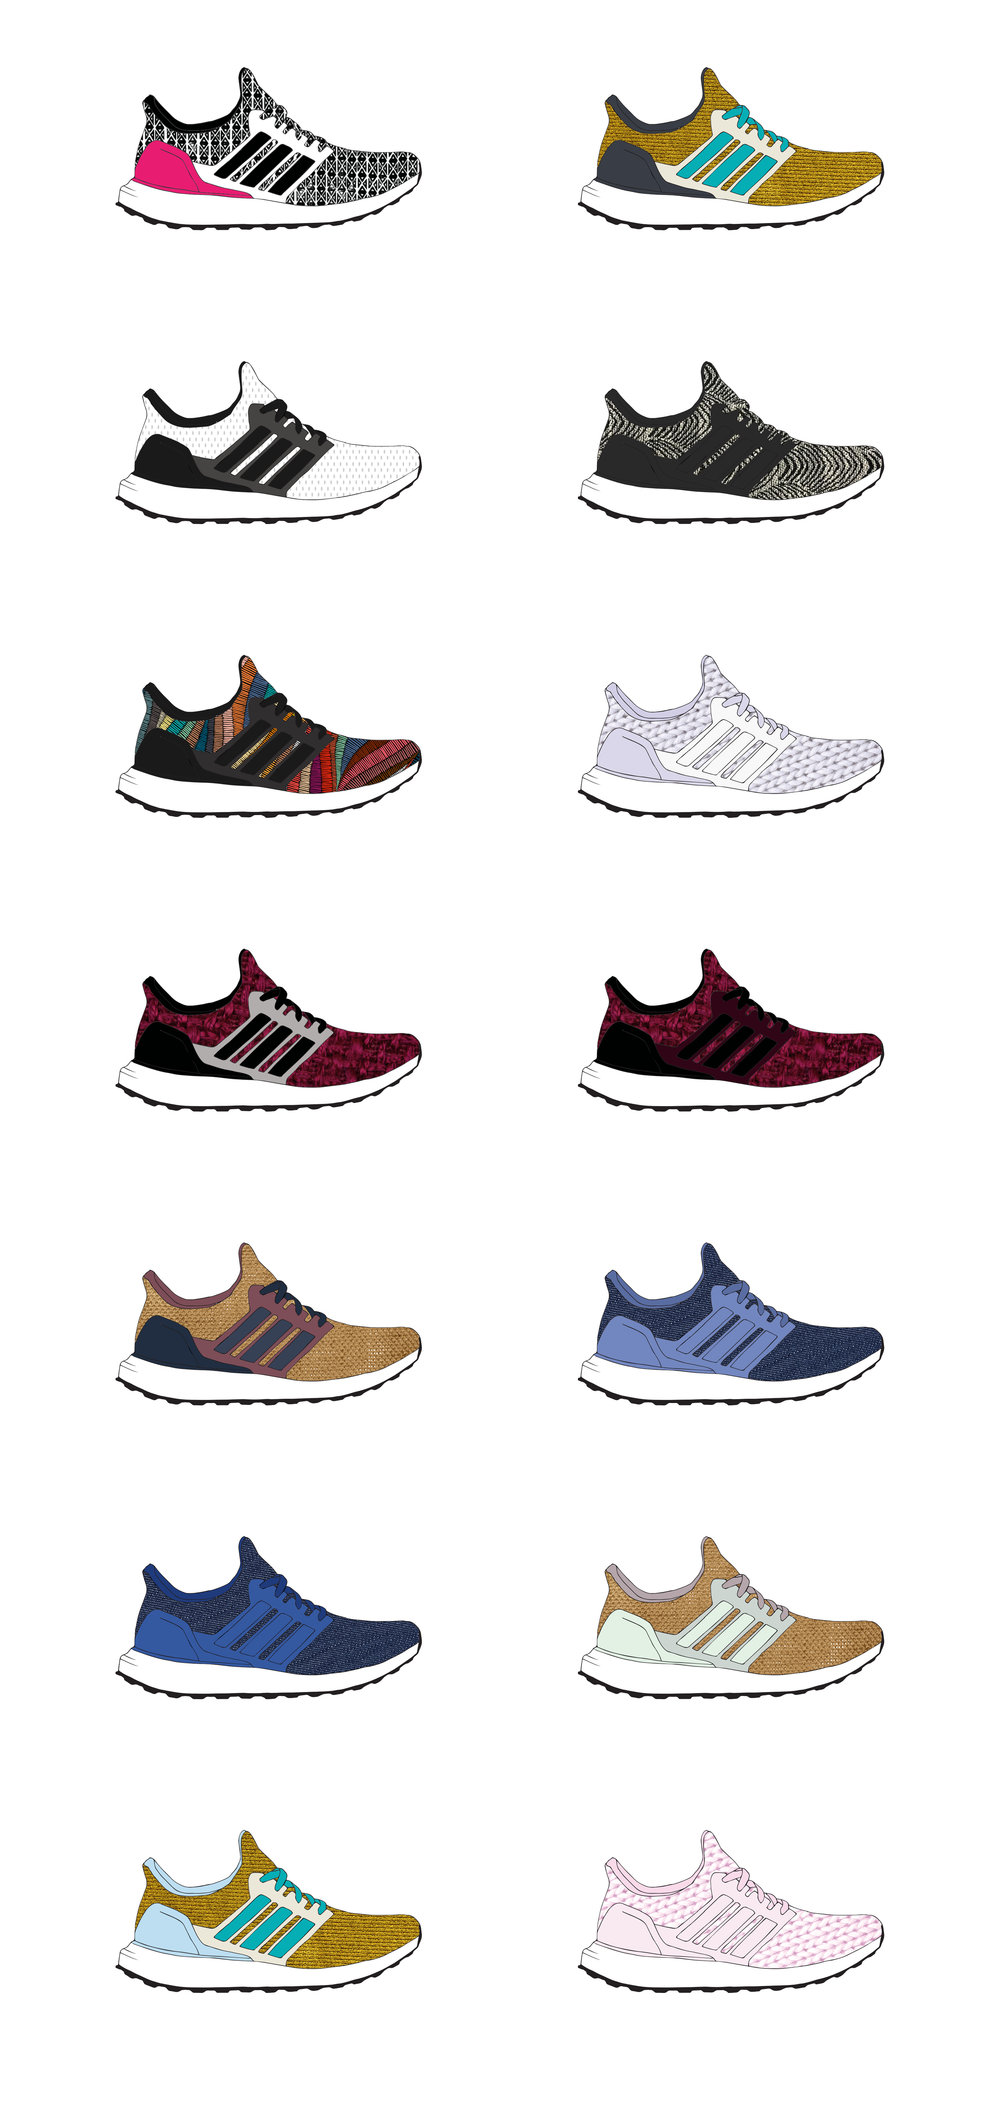 Final_Color_Comps.jpg